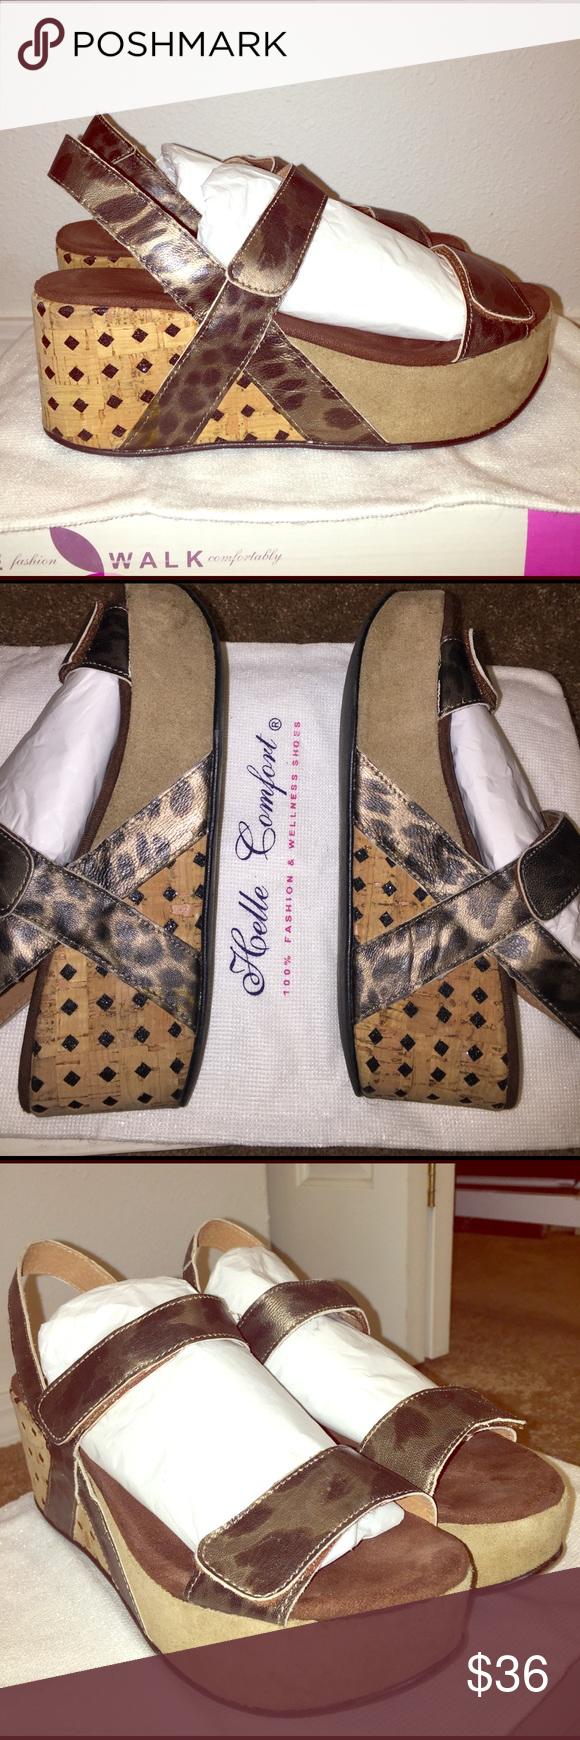 tasnim comfort women snake ltf metallic off to esport discount helle up shoes womens walking c com comforter aqua sandals